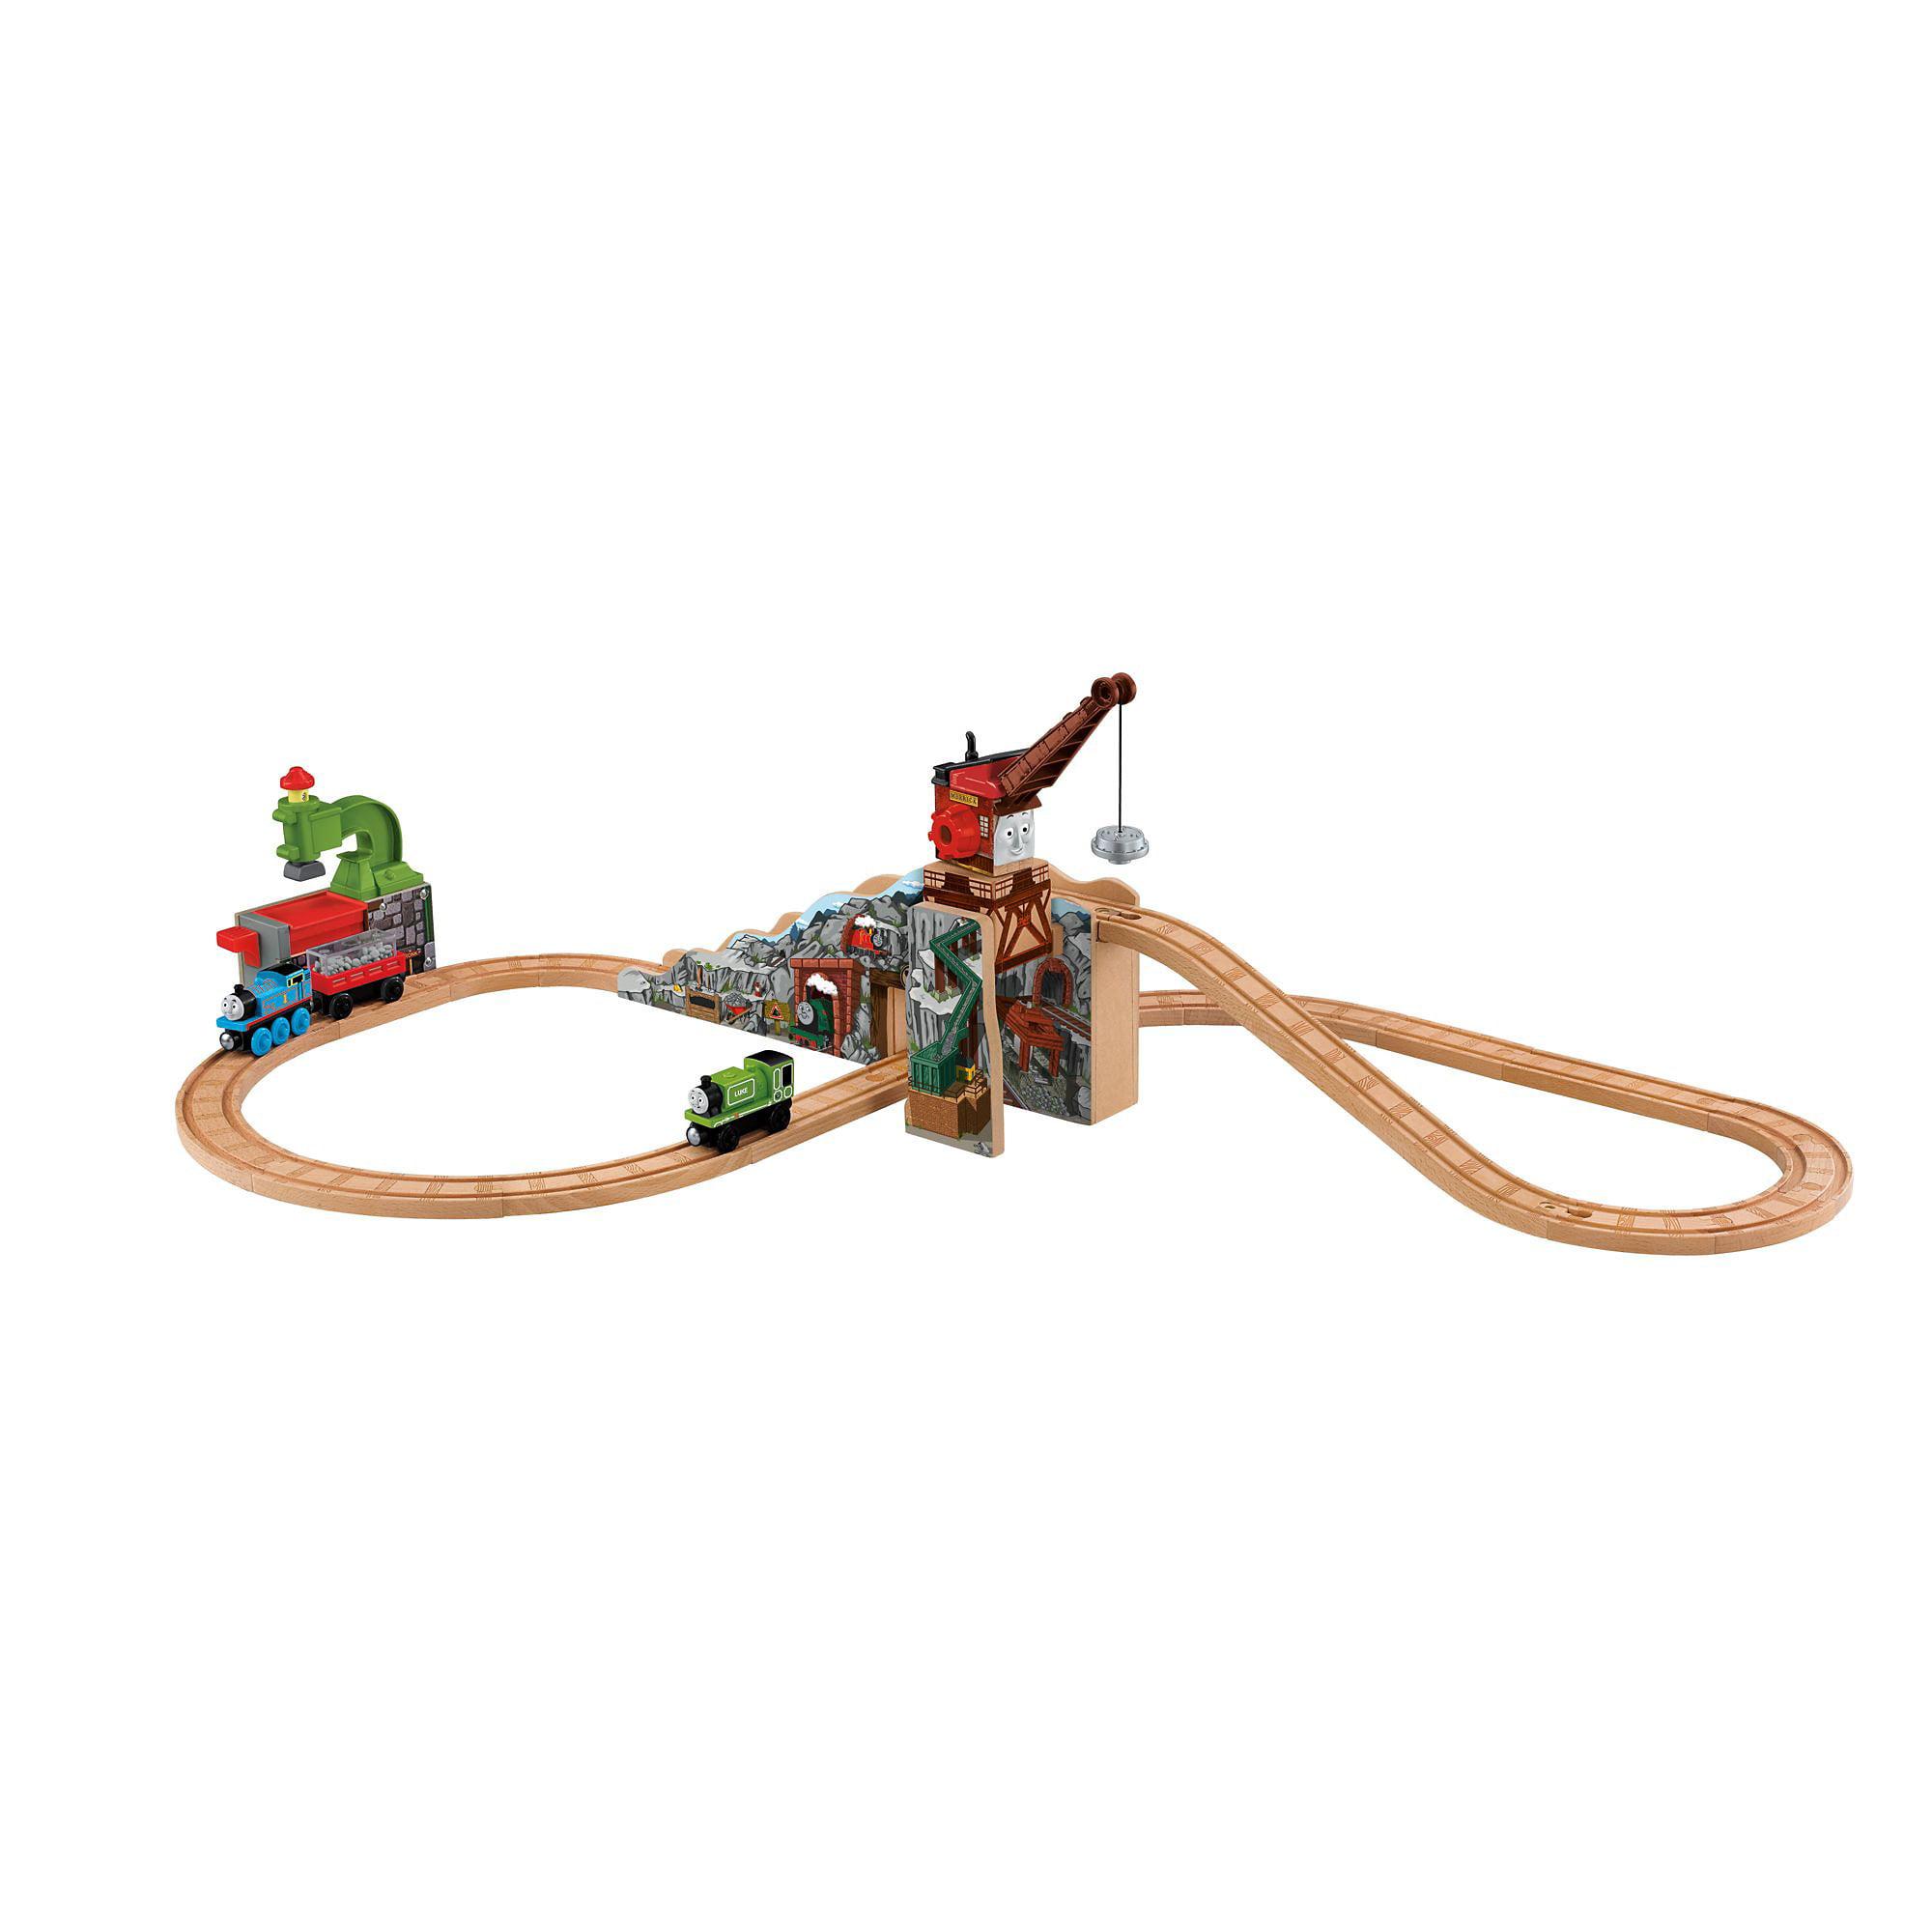 Fisher Price Thomas Wooden Railway Merrick and The Rock Crusher by Mattel